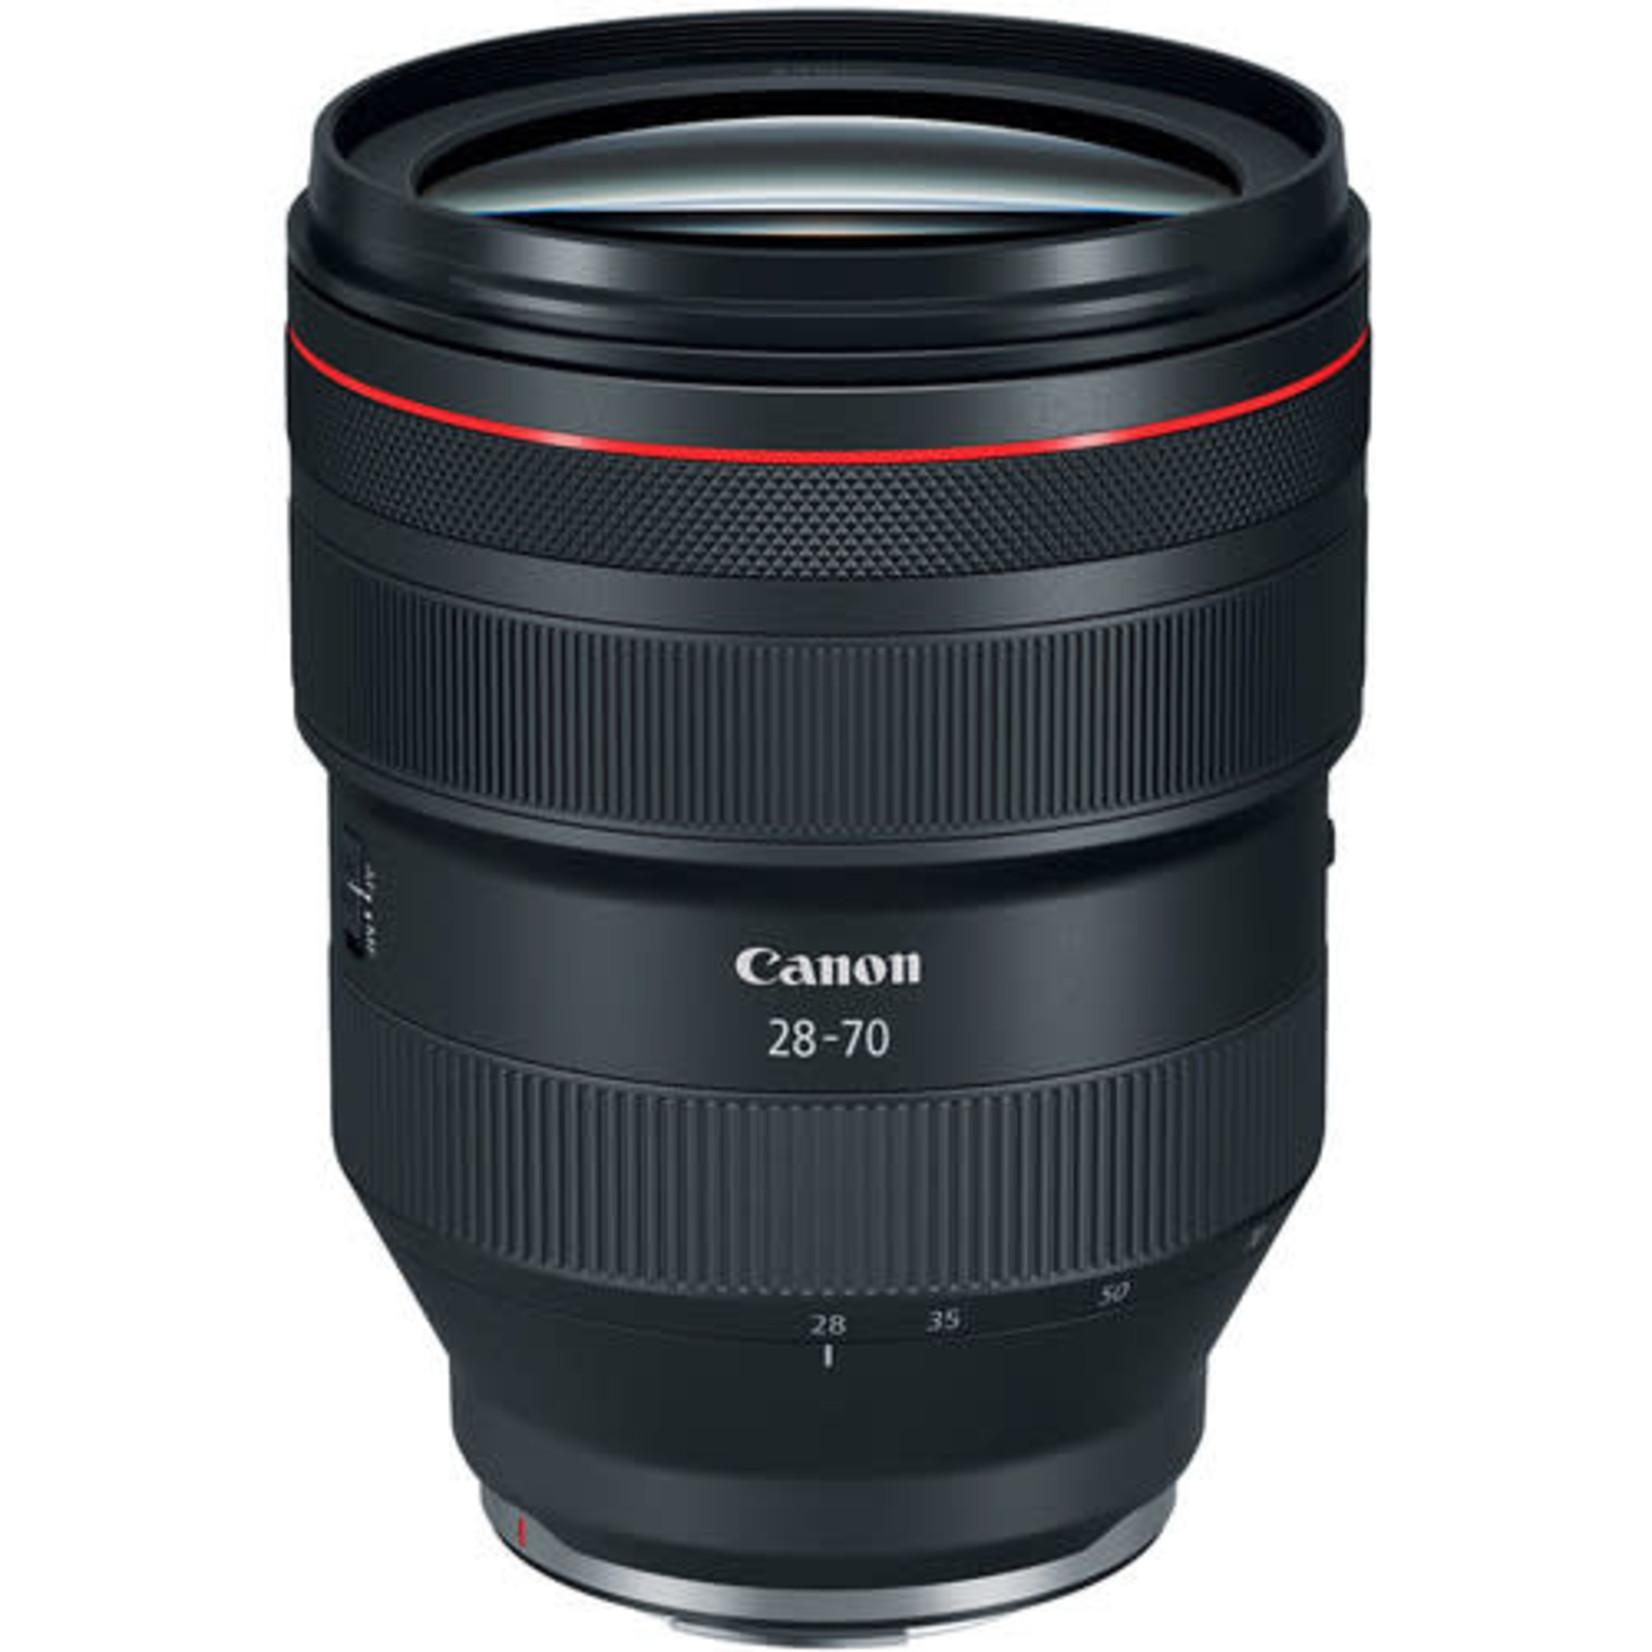 Canon Canon RF 28-70mm f/2L USM Lens